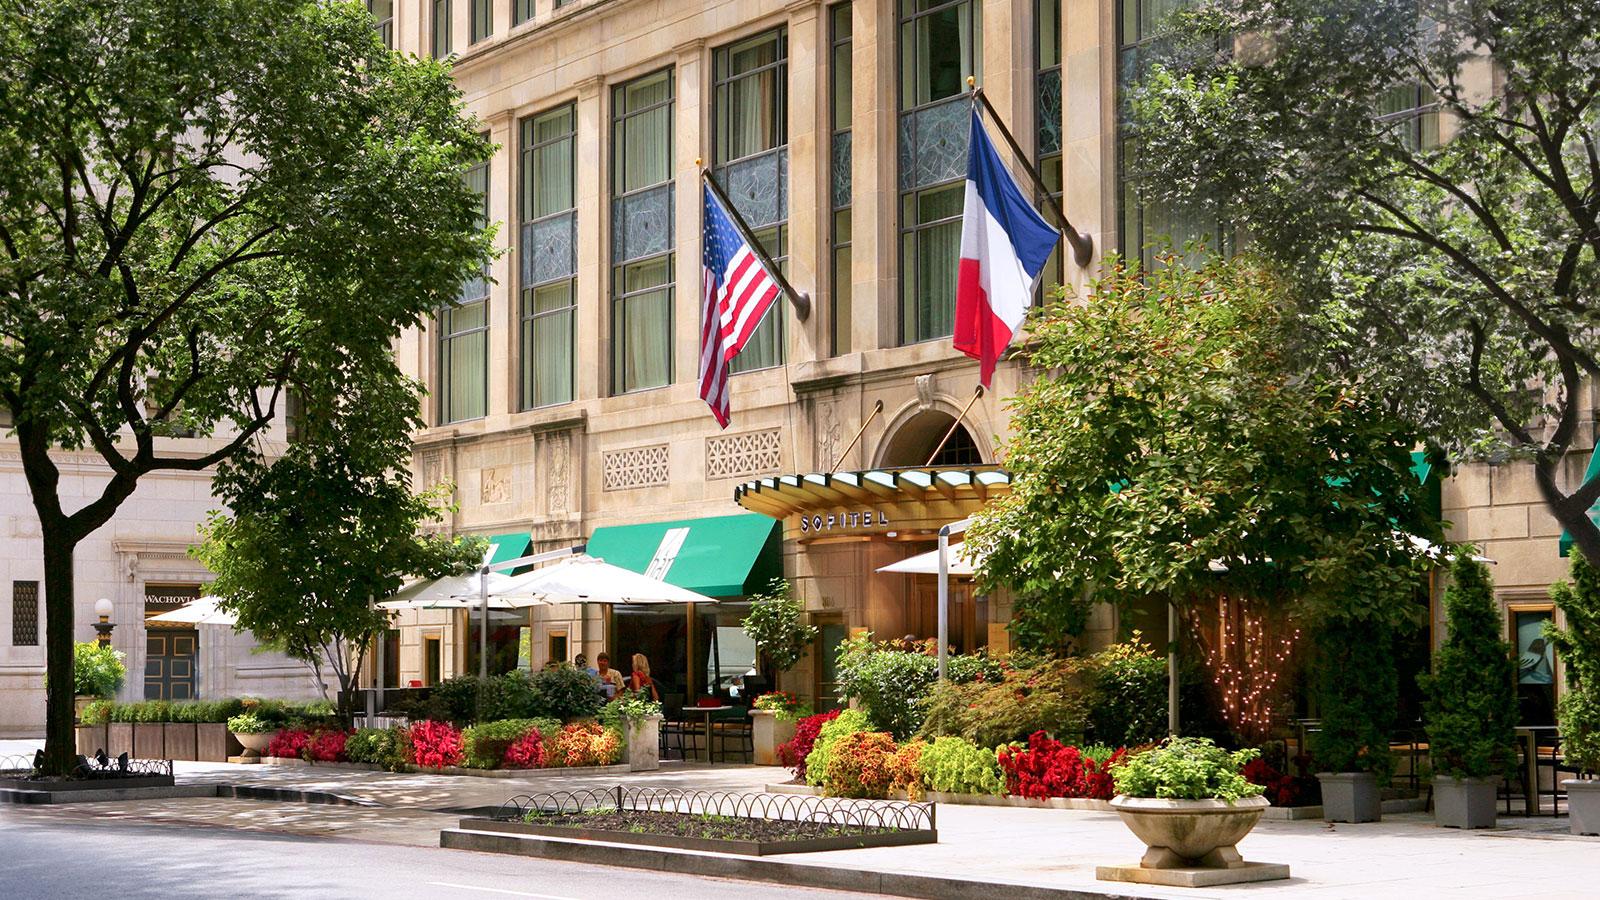 Image of Entrance Sofitel Washington DC Lafayette Square, 1927, Member of Historic Hotels of America, in Washington DC, Overview